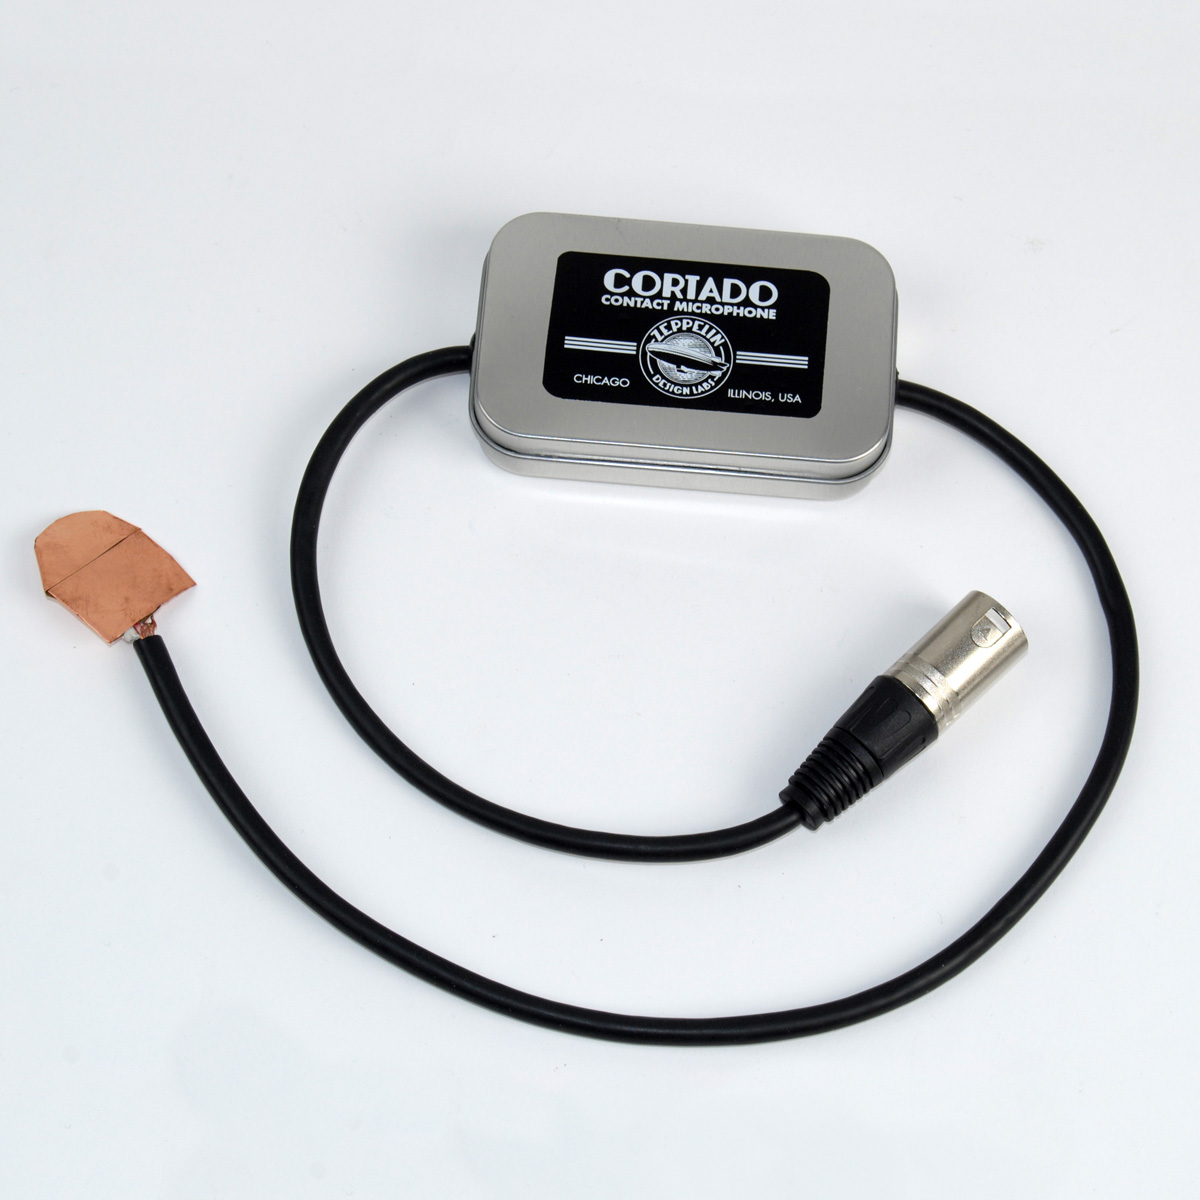 Cortado Balanced Output Piezo Contact Microphone